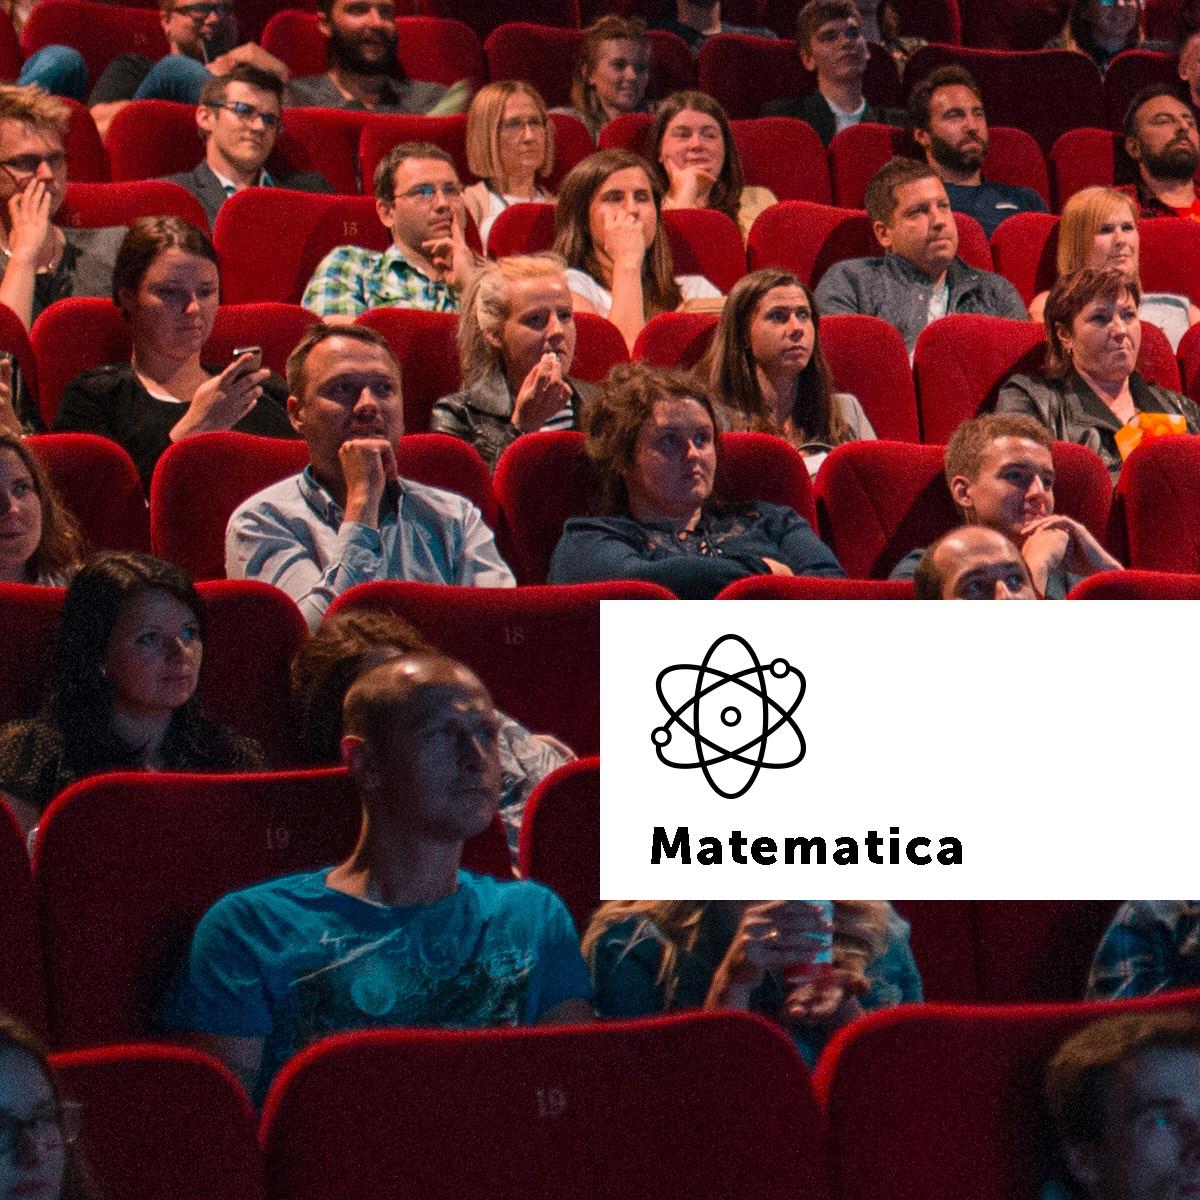 Matematica al cinema